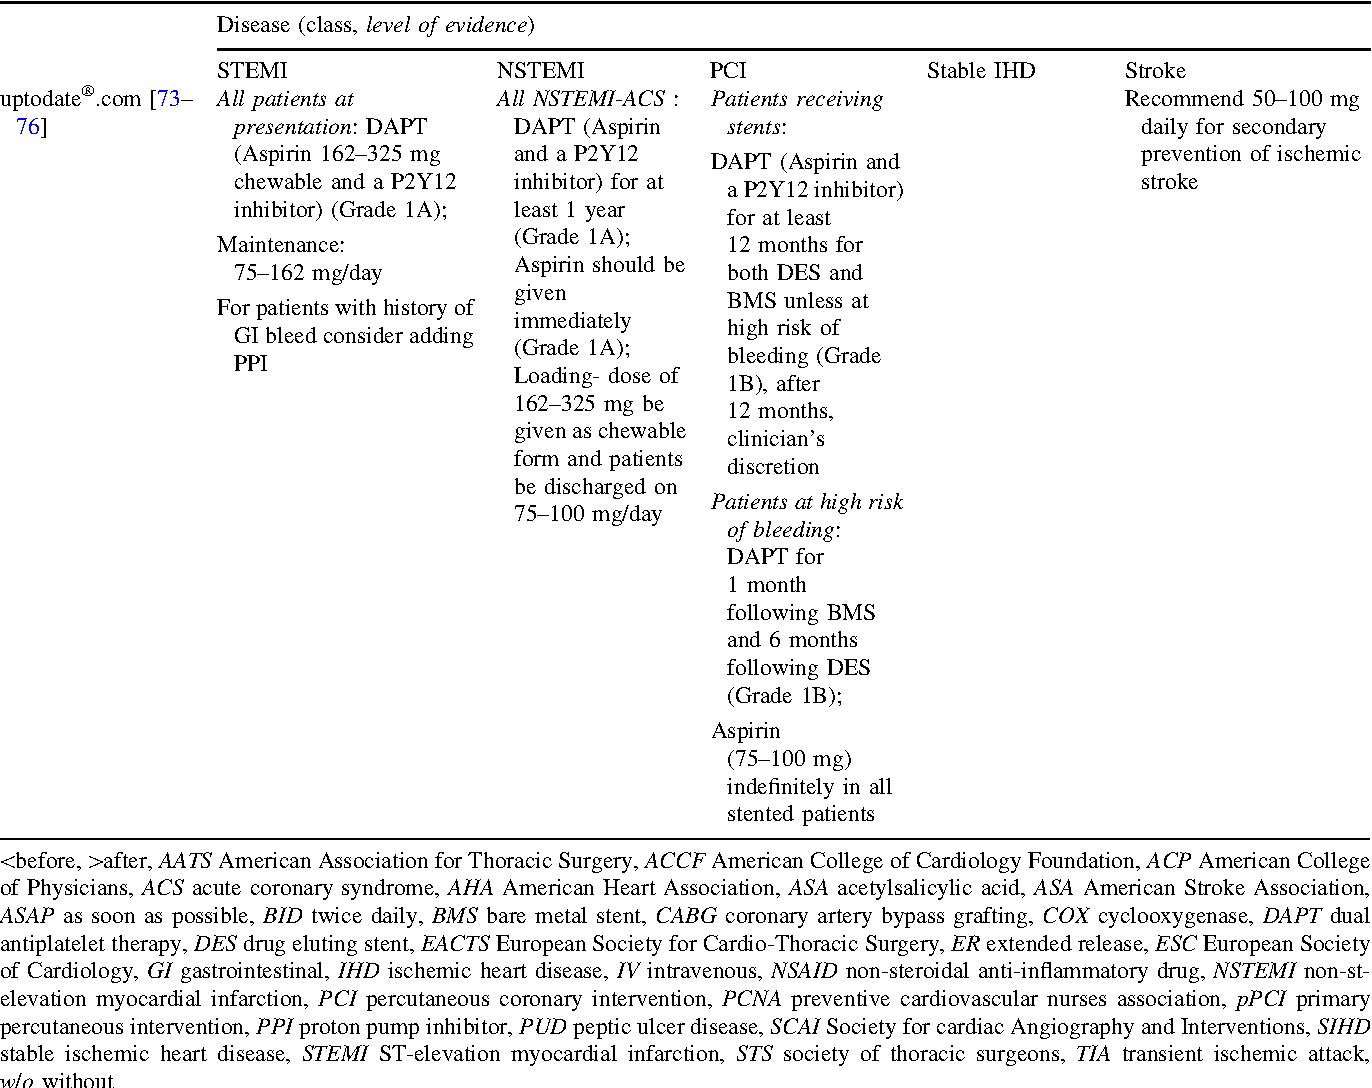 Aspirin dosing in cardiovascular disease prevention and